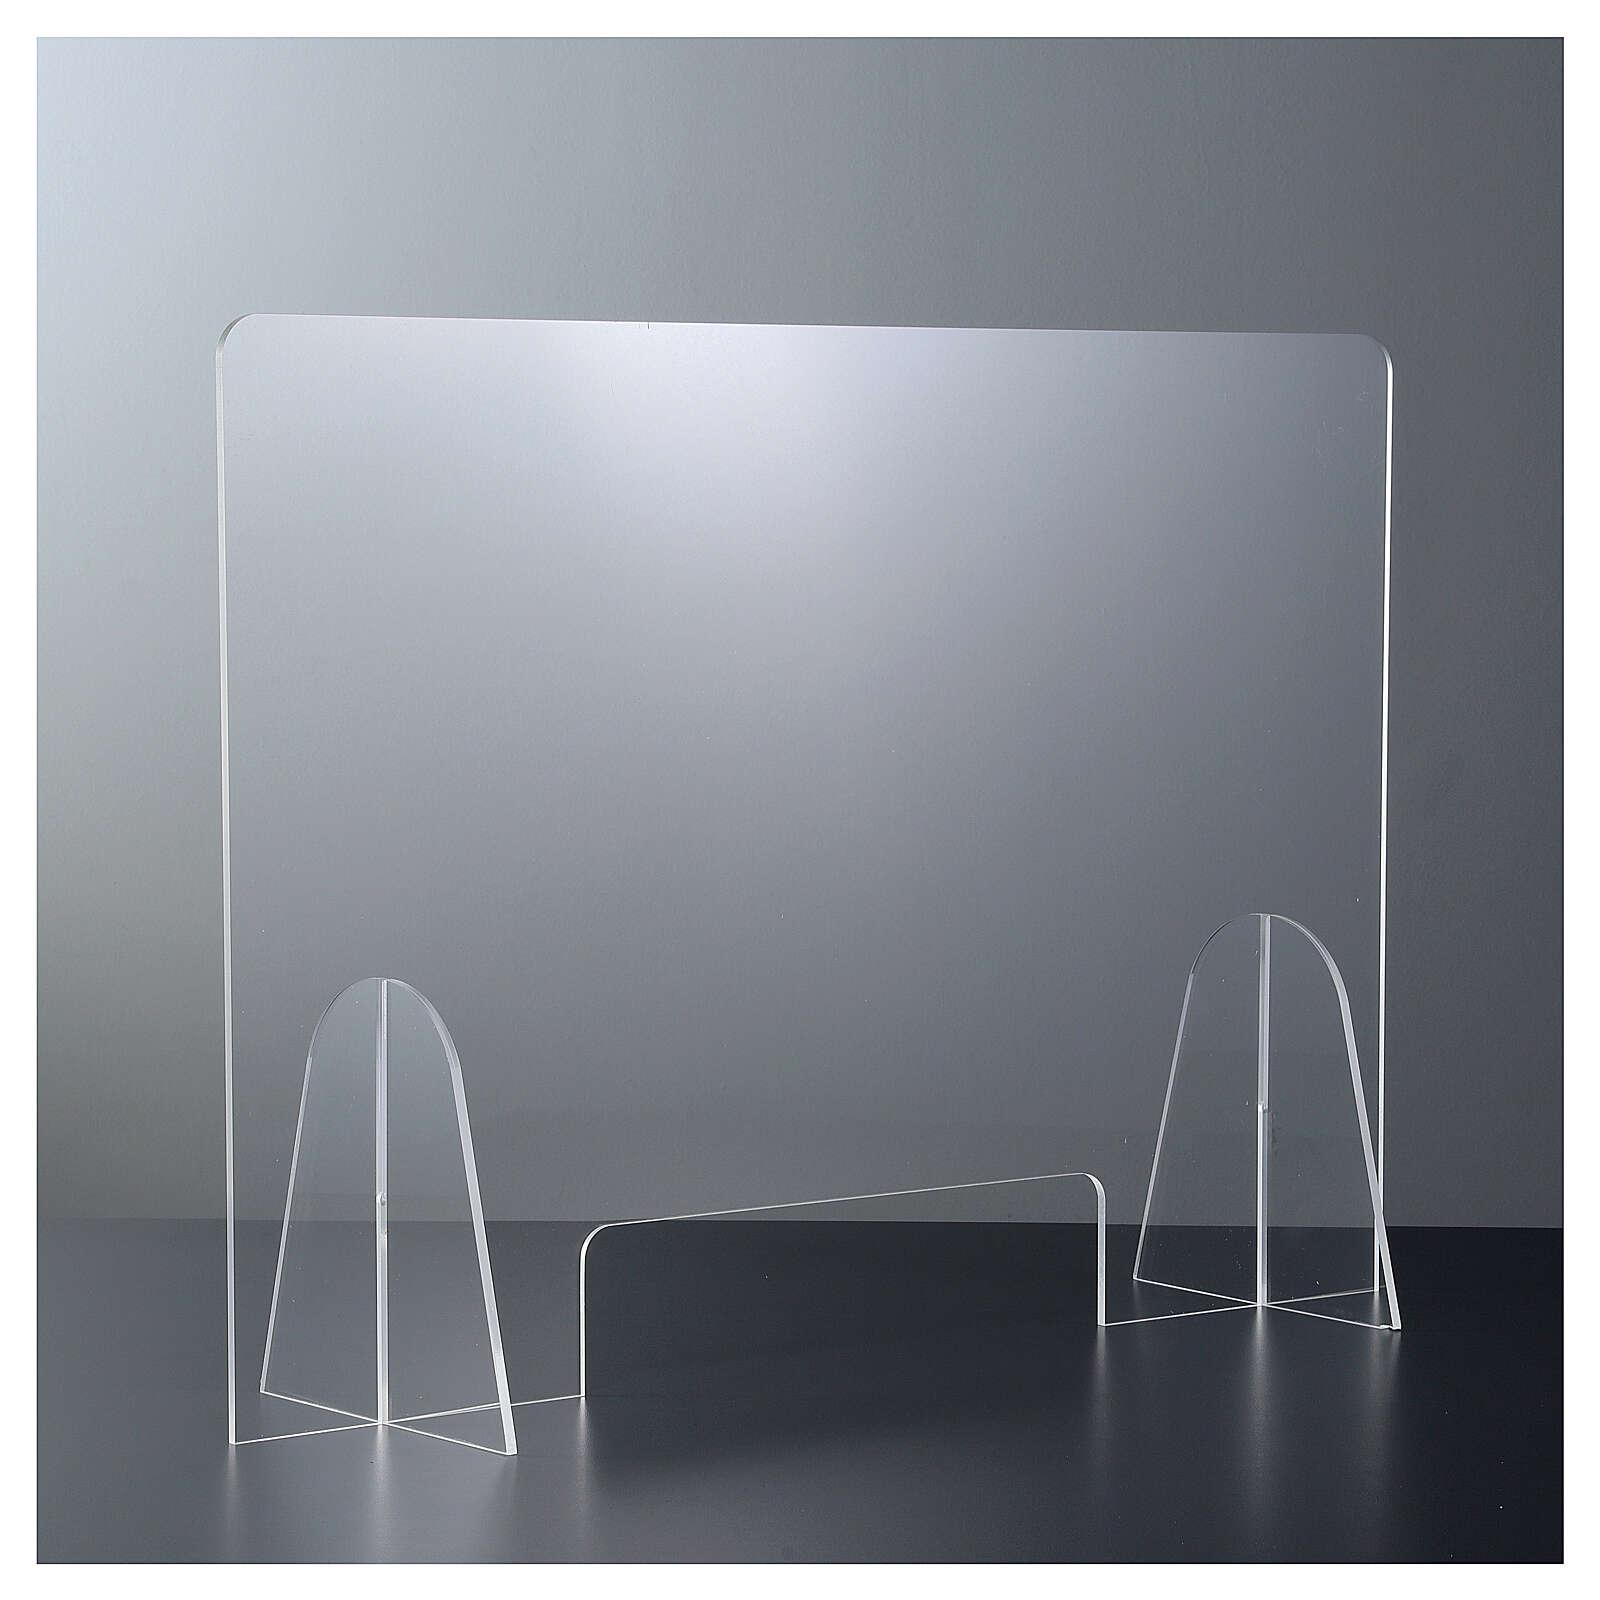 Lastra parafiato plexiglass 50x70 finestra 15x30 3